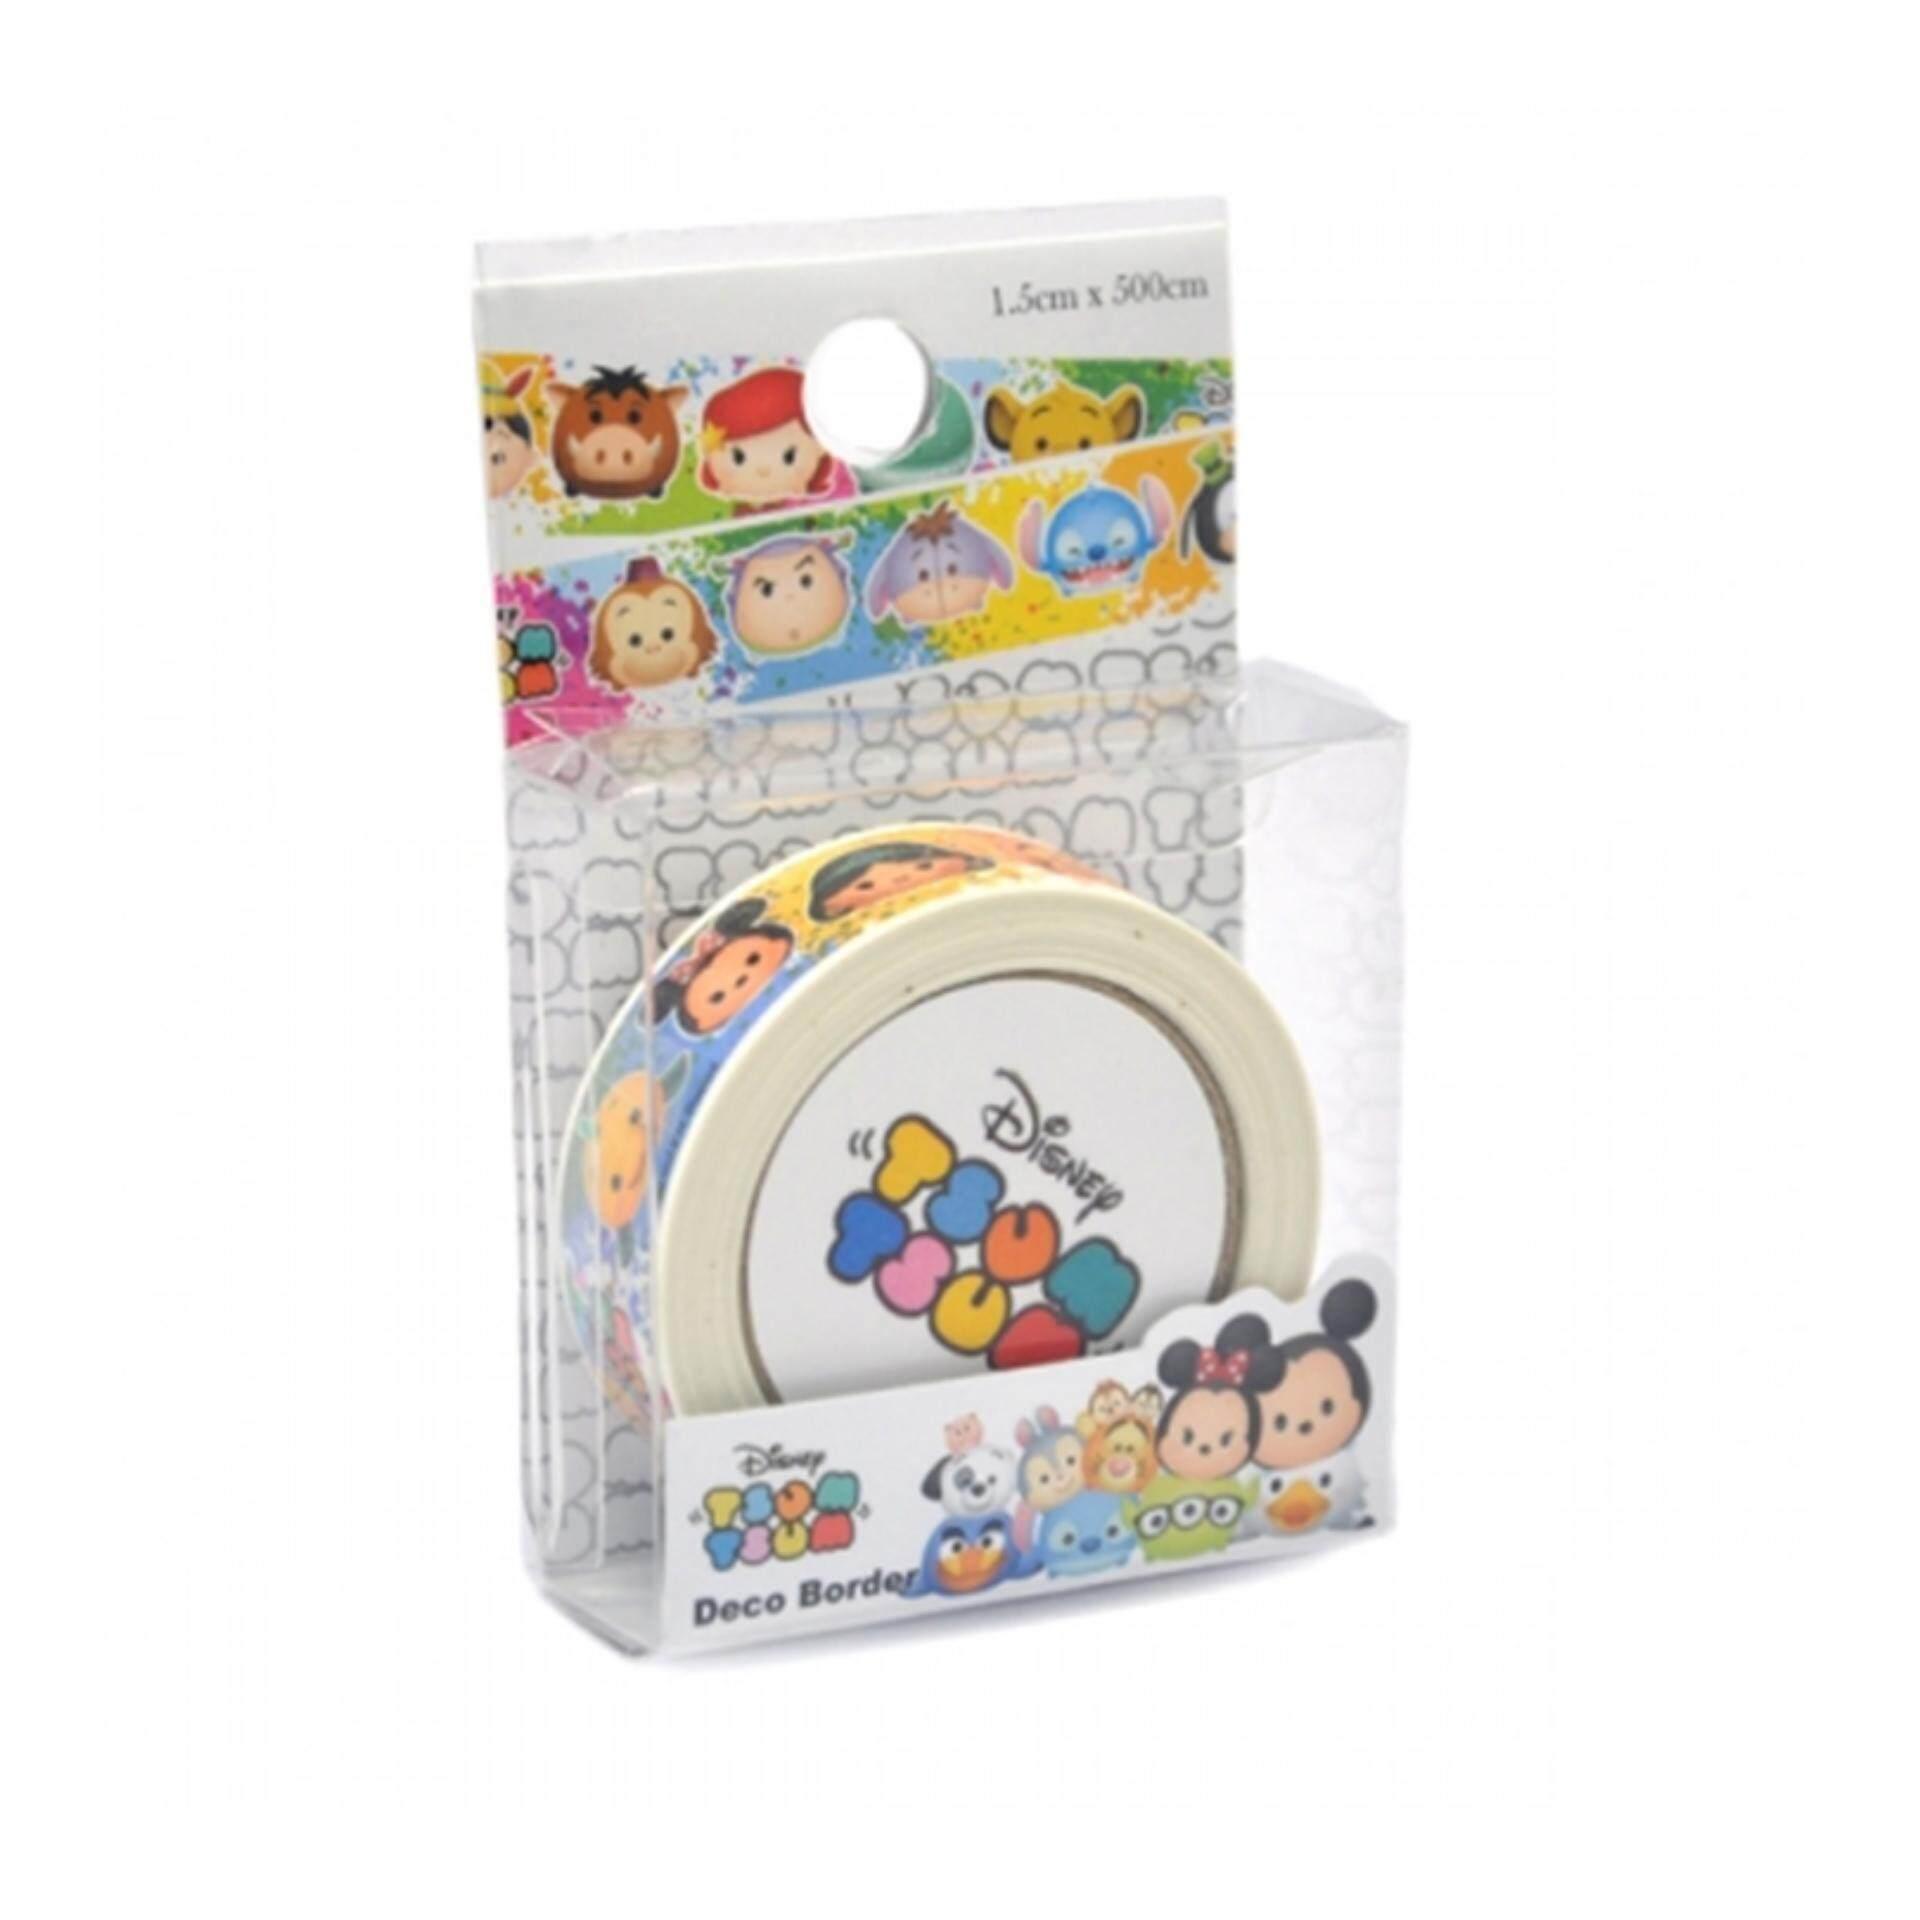 Disney Tsum Tsum Deco Border Sticker - Aladin